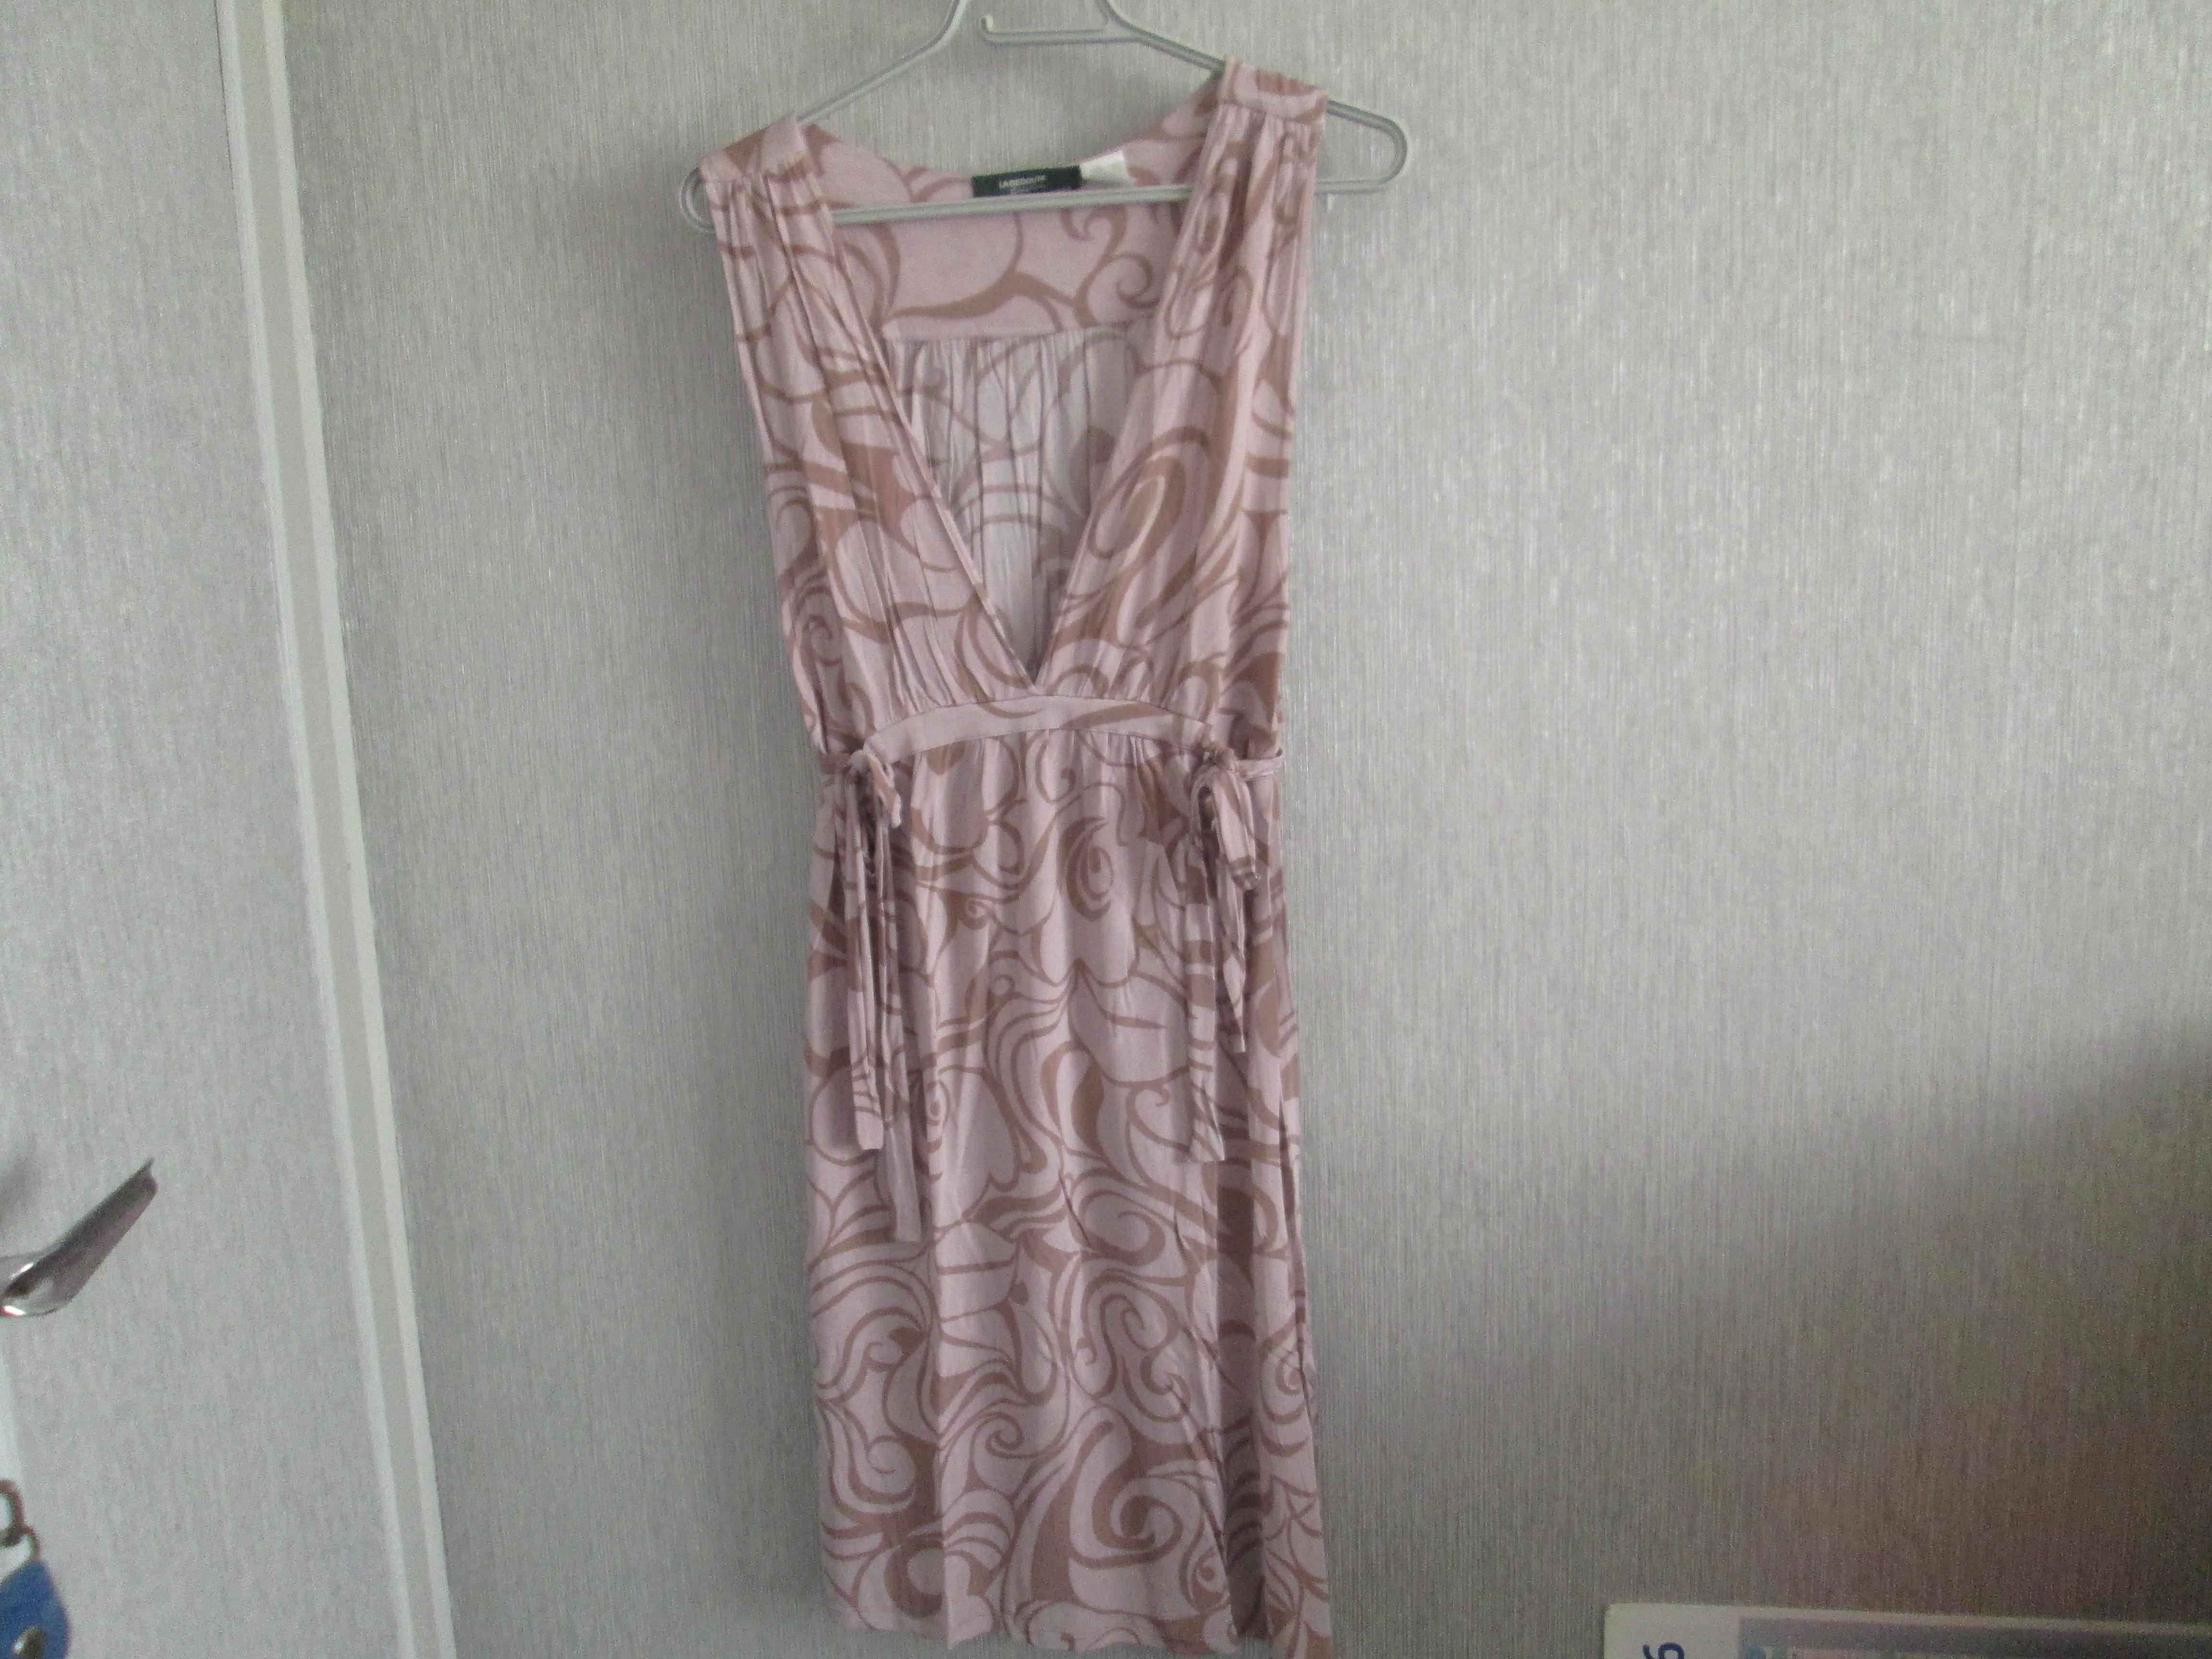 troc de troc robe beige taille 42   la redoute 7 noisettes image 0